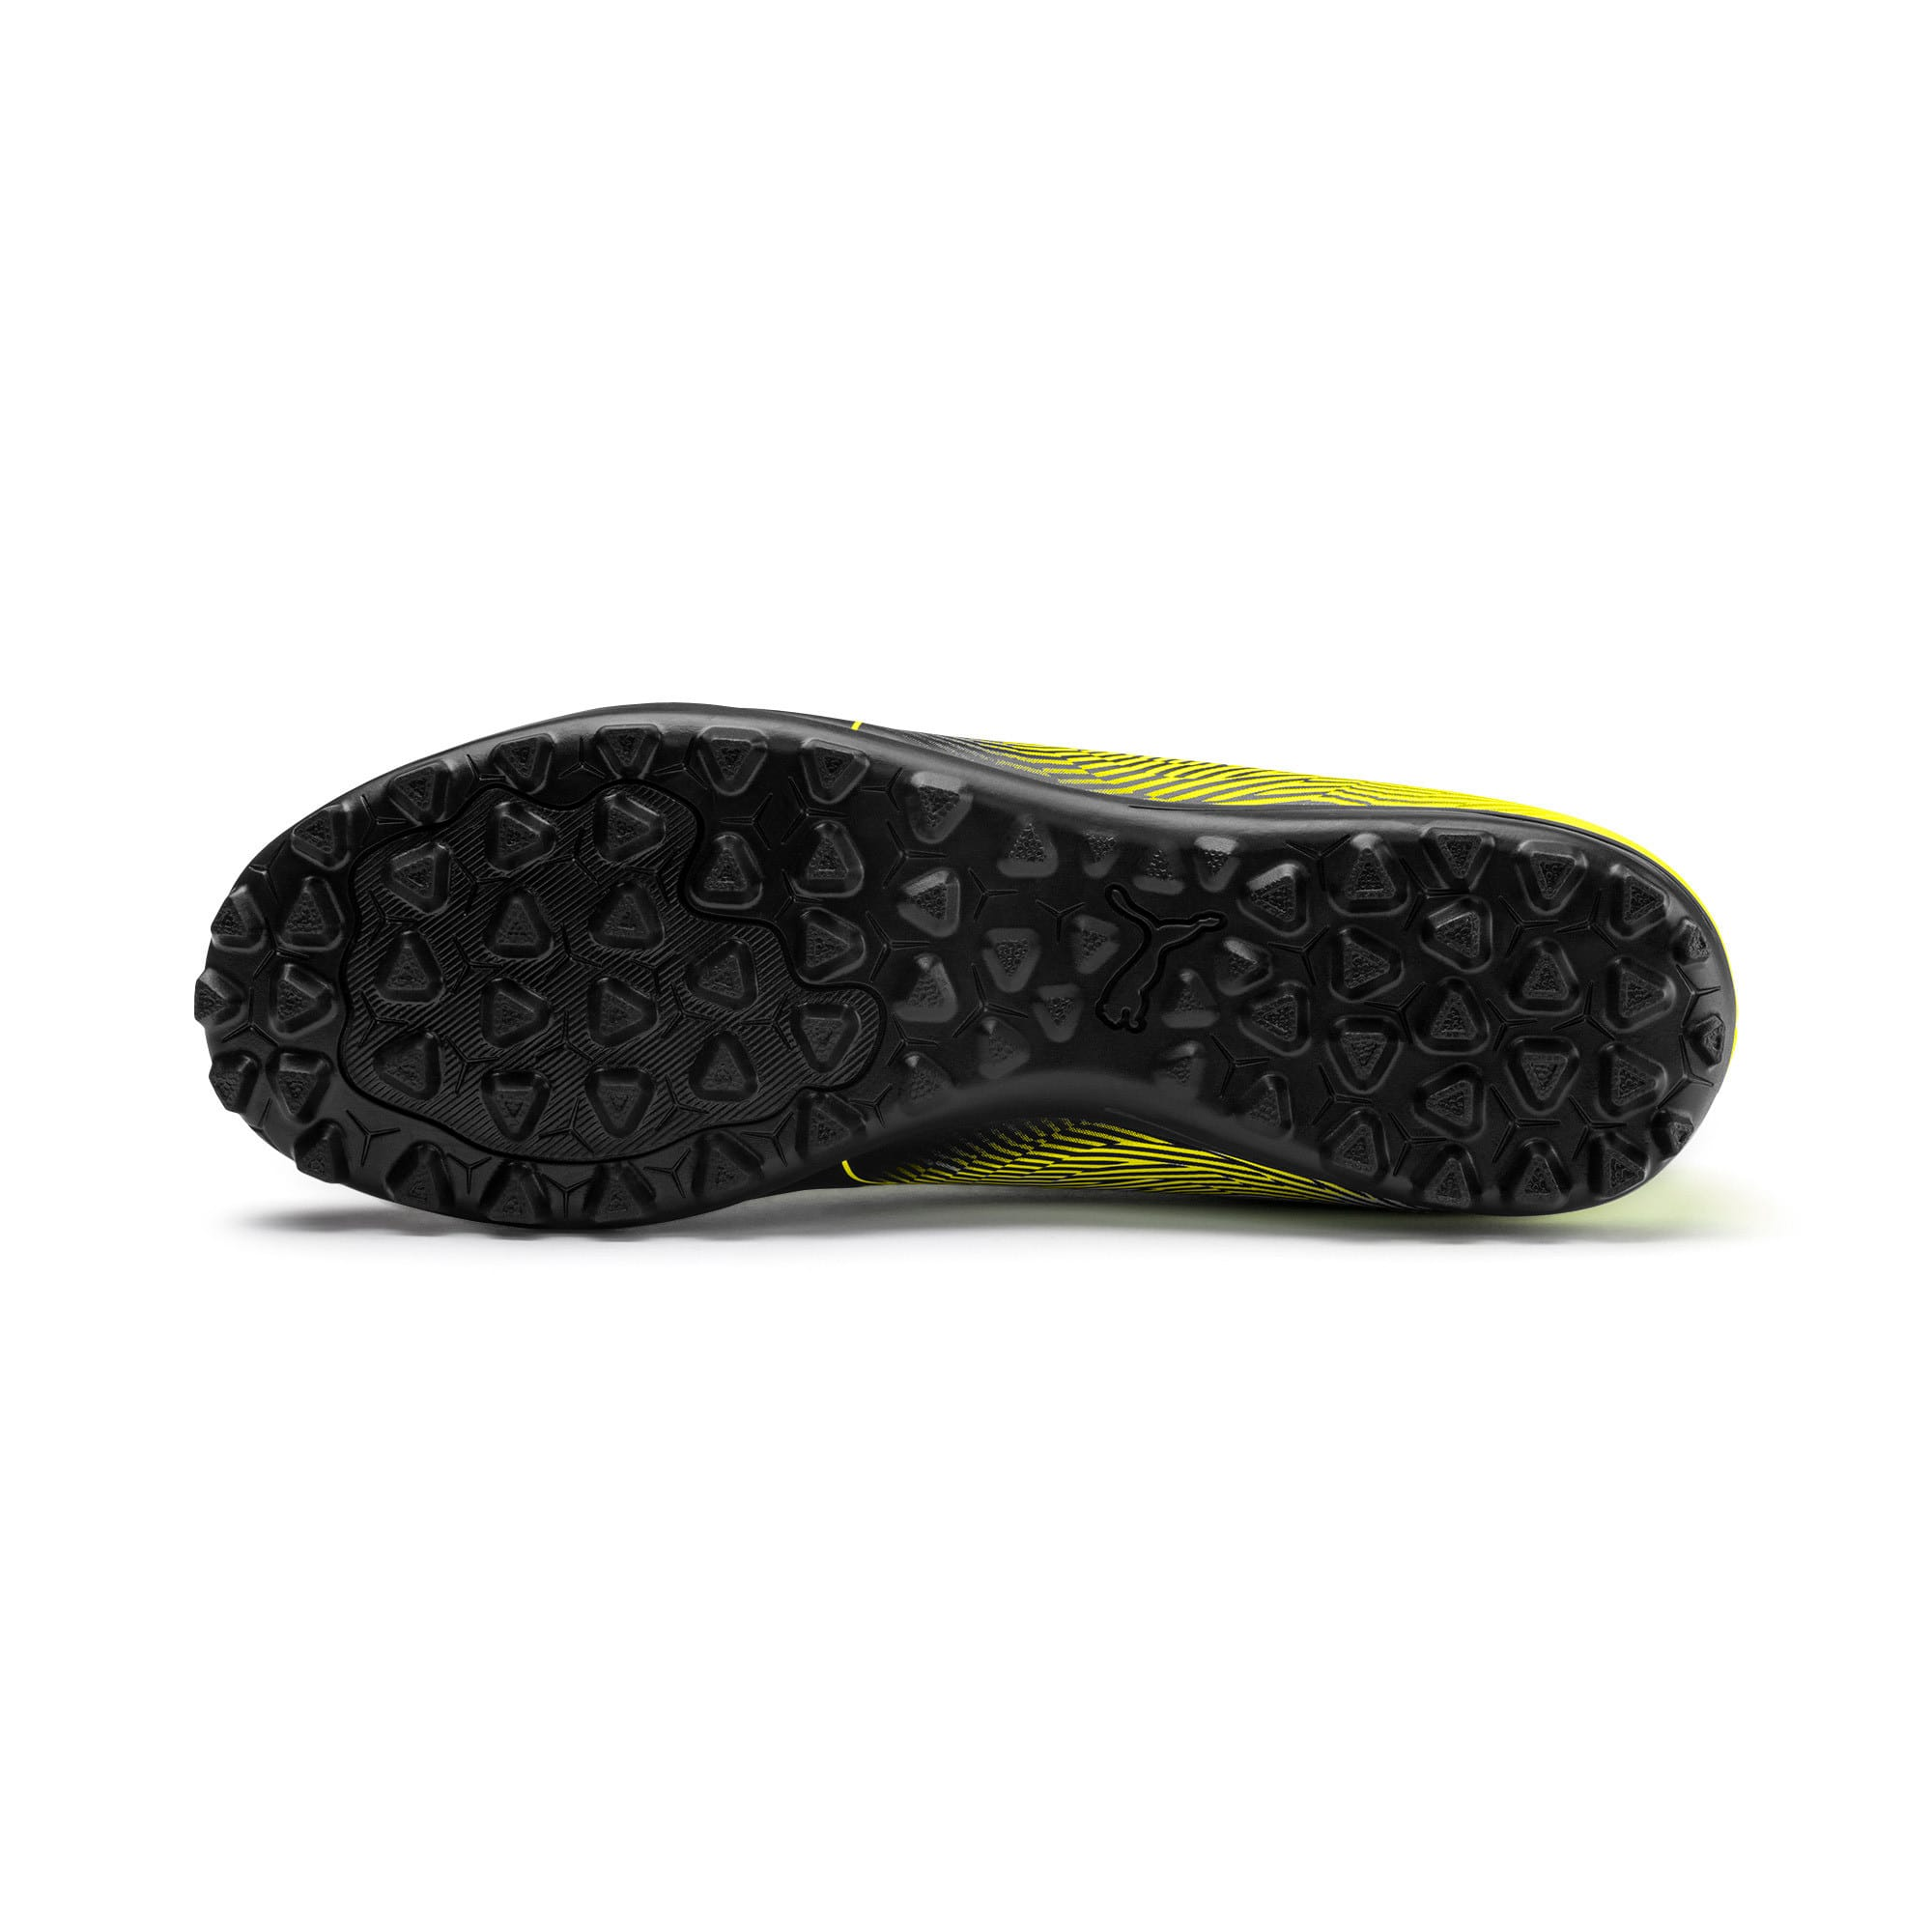 Thumbnail 5 of PUMA Spirit II TT Men's Soccer Shoes, Puma Black-Yellow Alert, medium